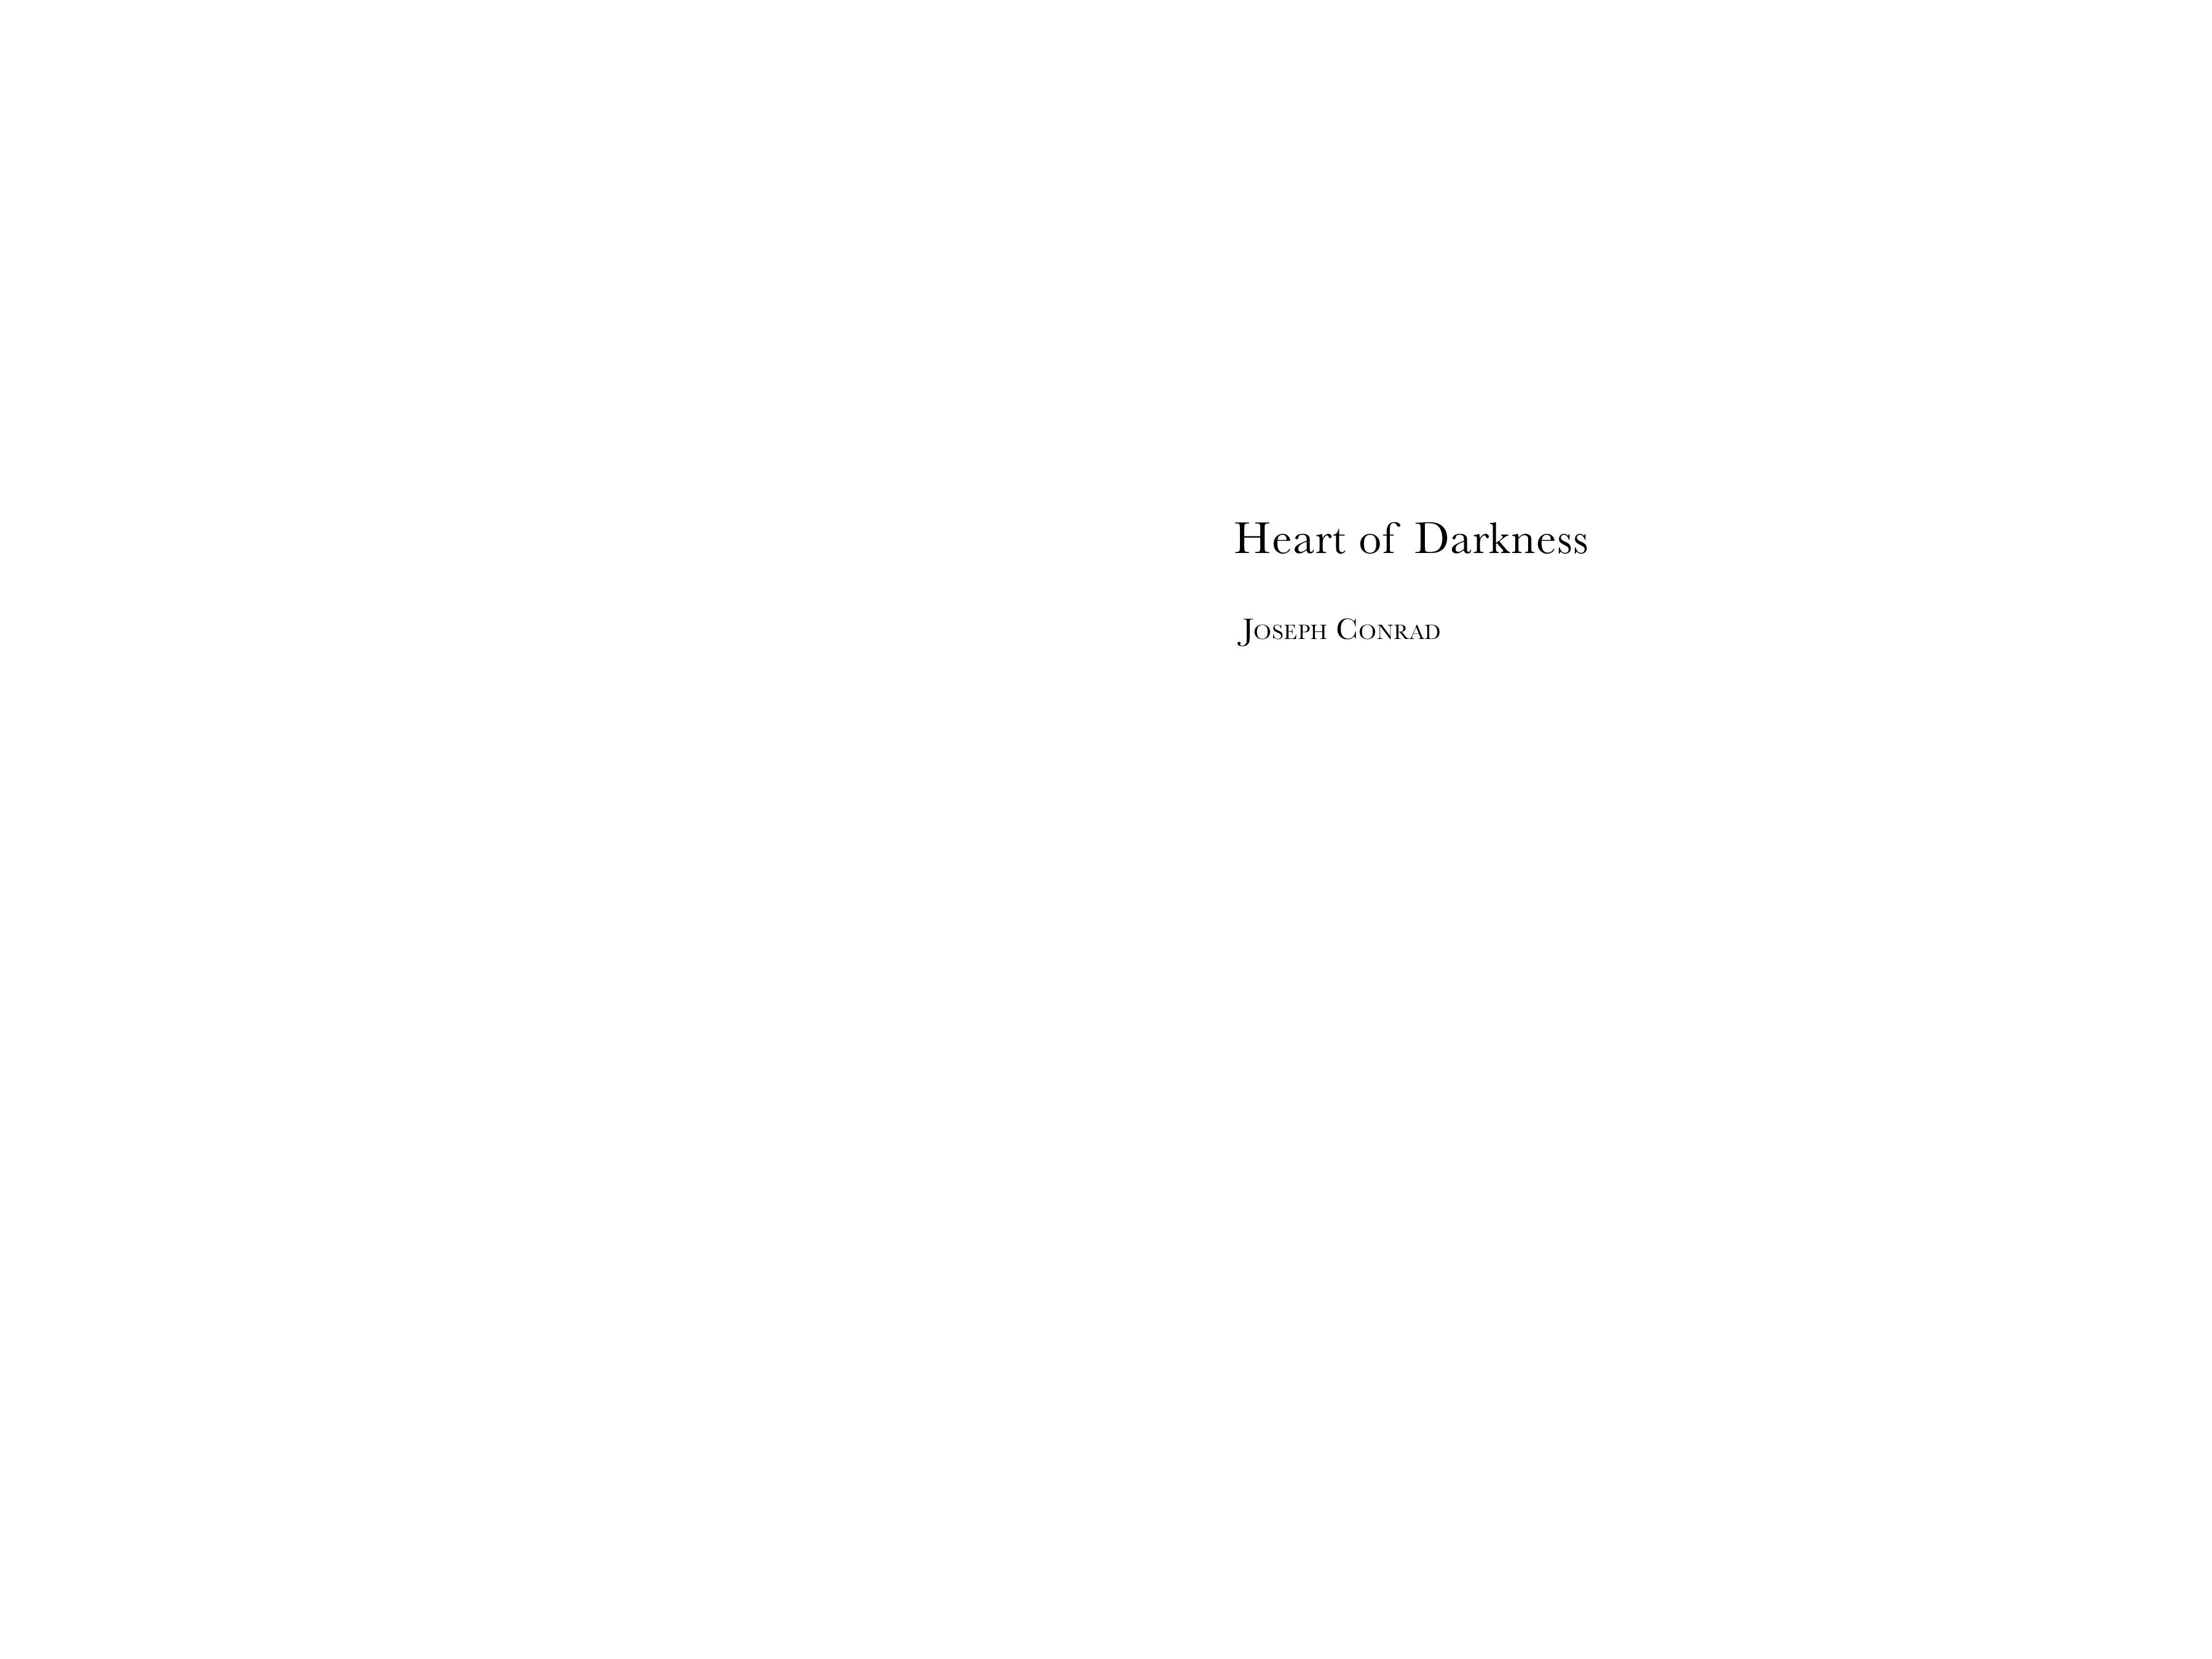 Heart of Darkness (spread 2)